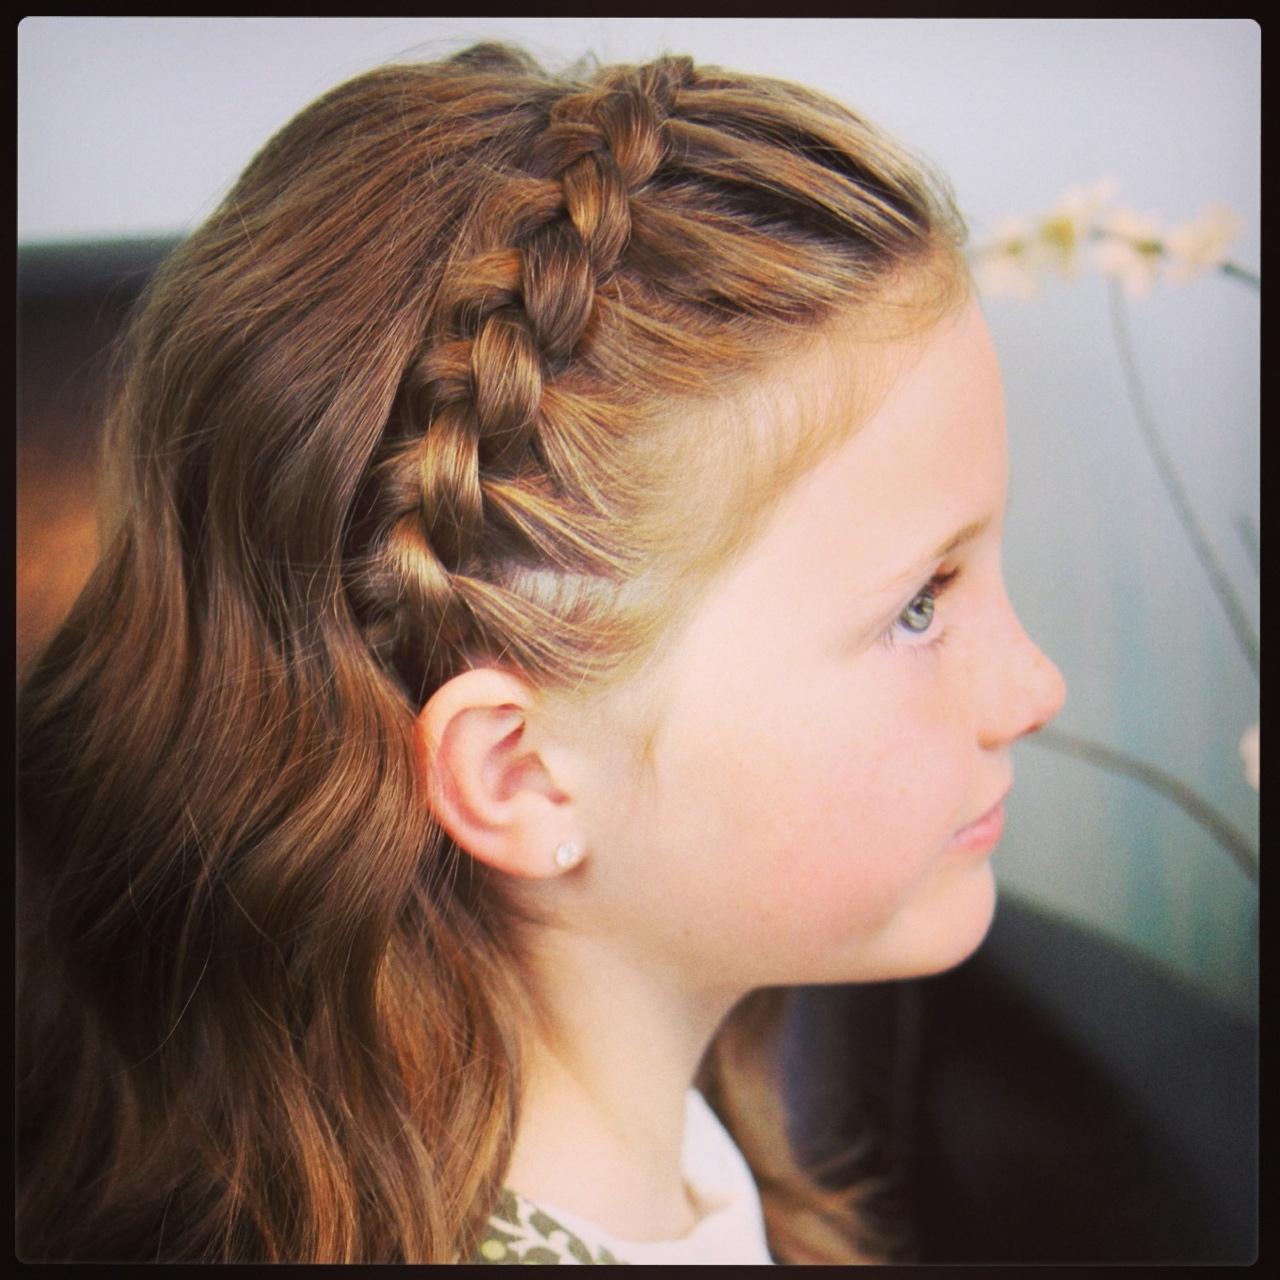 Eccezionale Acconciature per cerimonie: i capelli lunghi - Blogmamma.it  FH18